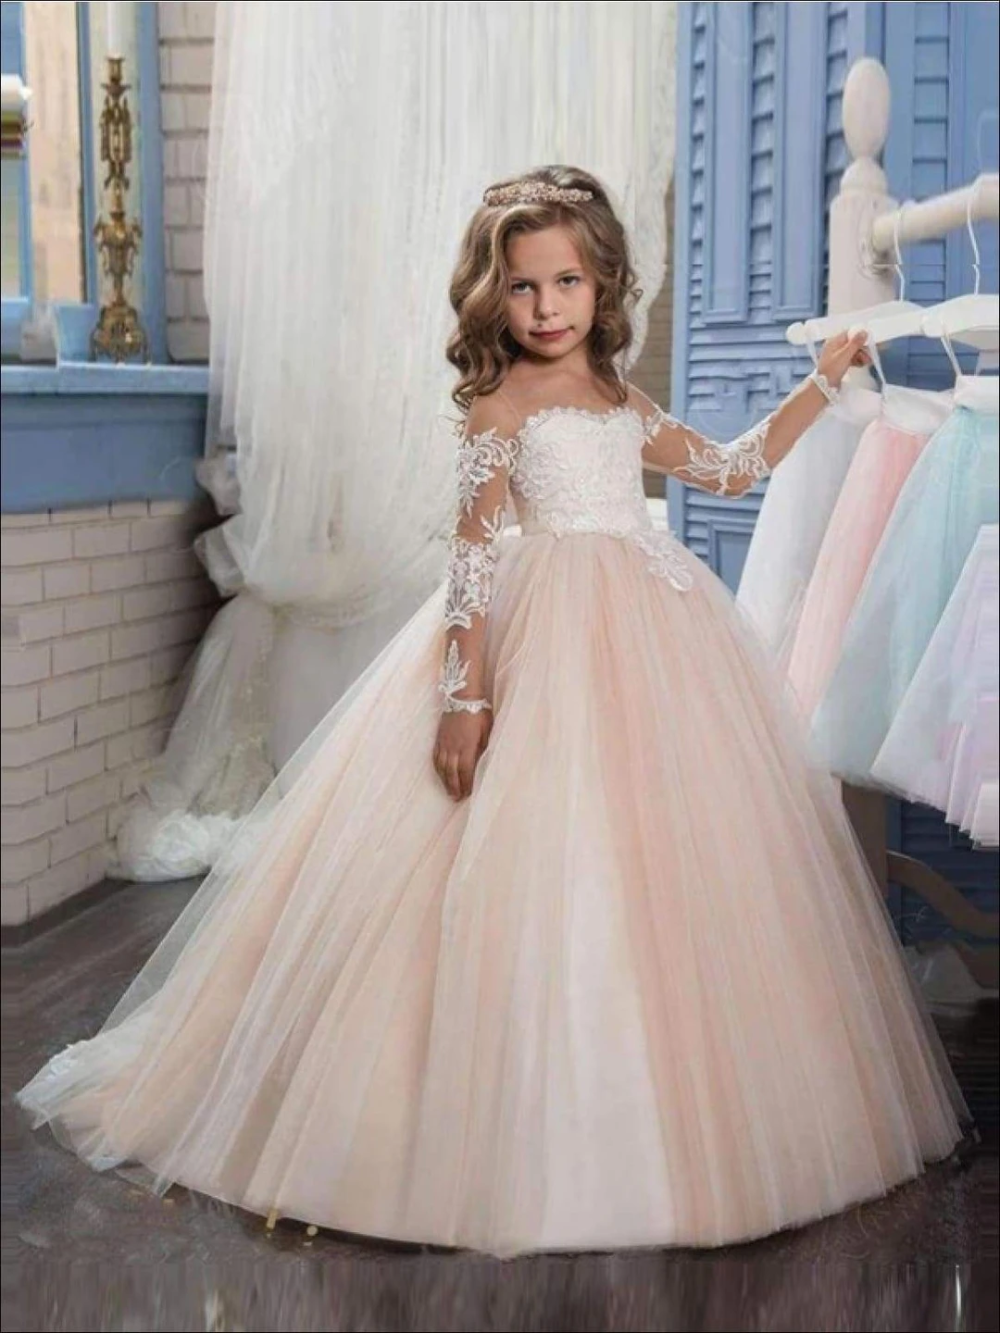 Lace Flower Girl Dress Birthday Girl Dress tutu Dress with Long Sleeves Floor Length Wedding Girl Dress Tulle Flower Girl Dress